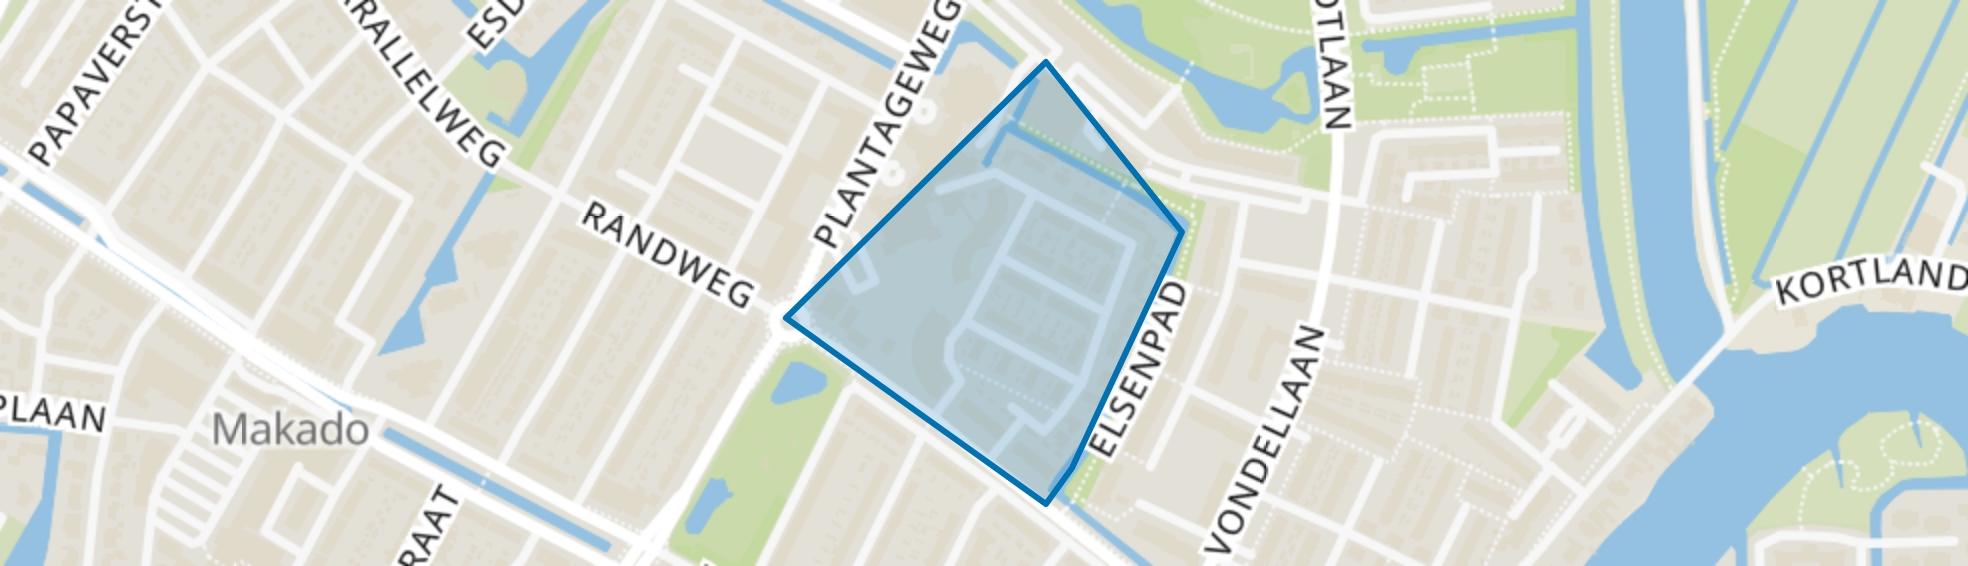 Oranjebuurt, Alblasserdam map